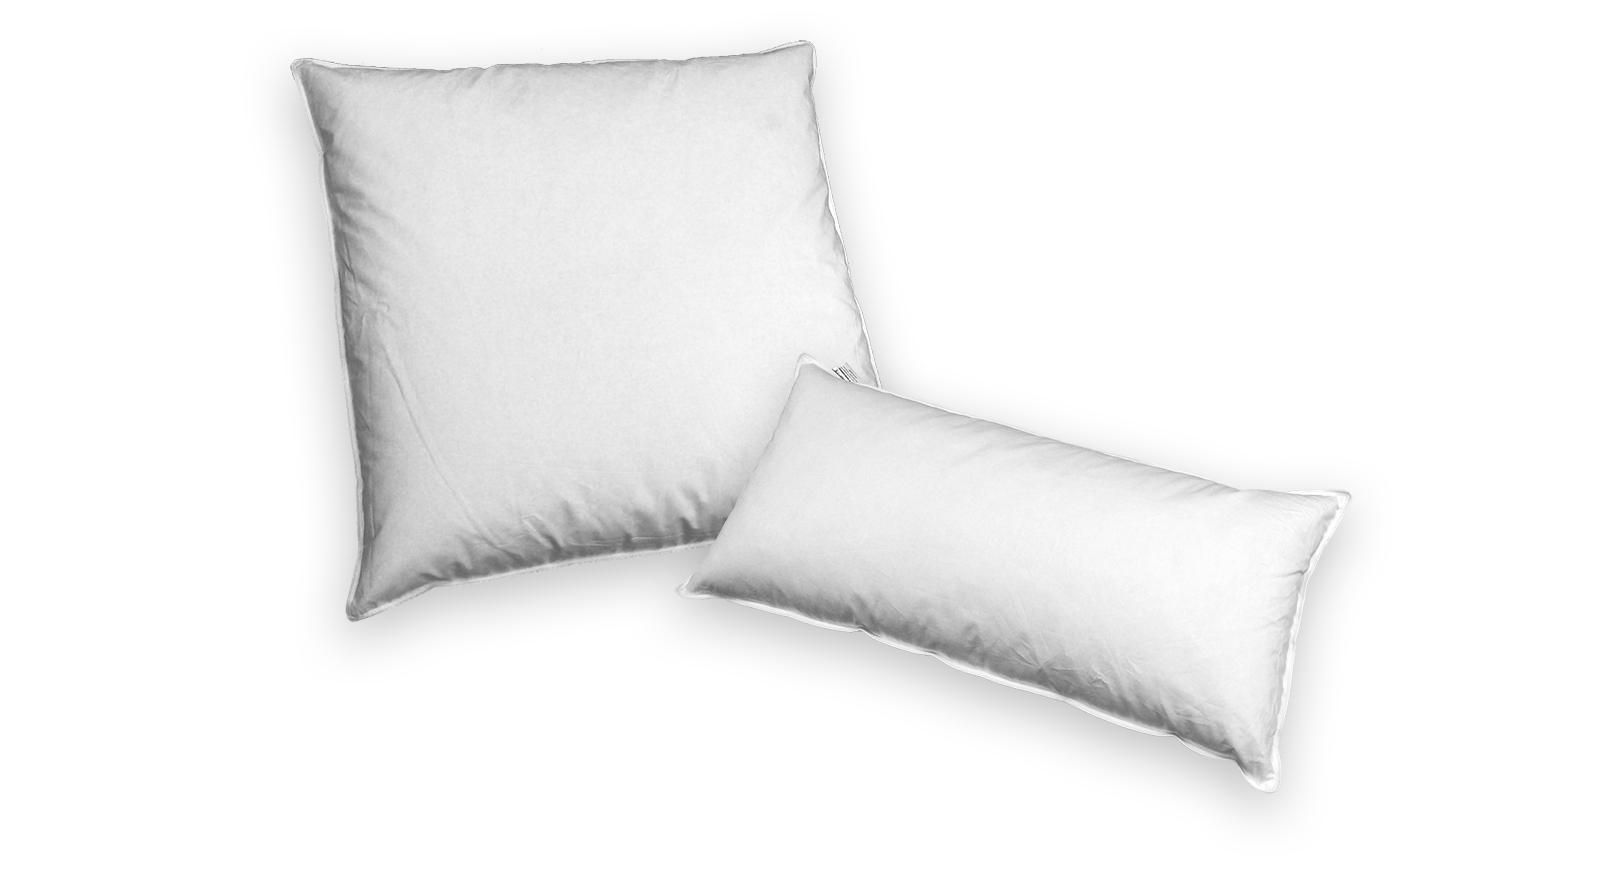 Daunenkissen cleversleep soft Öko-Tex Standard